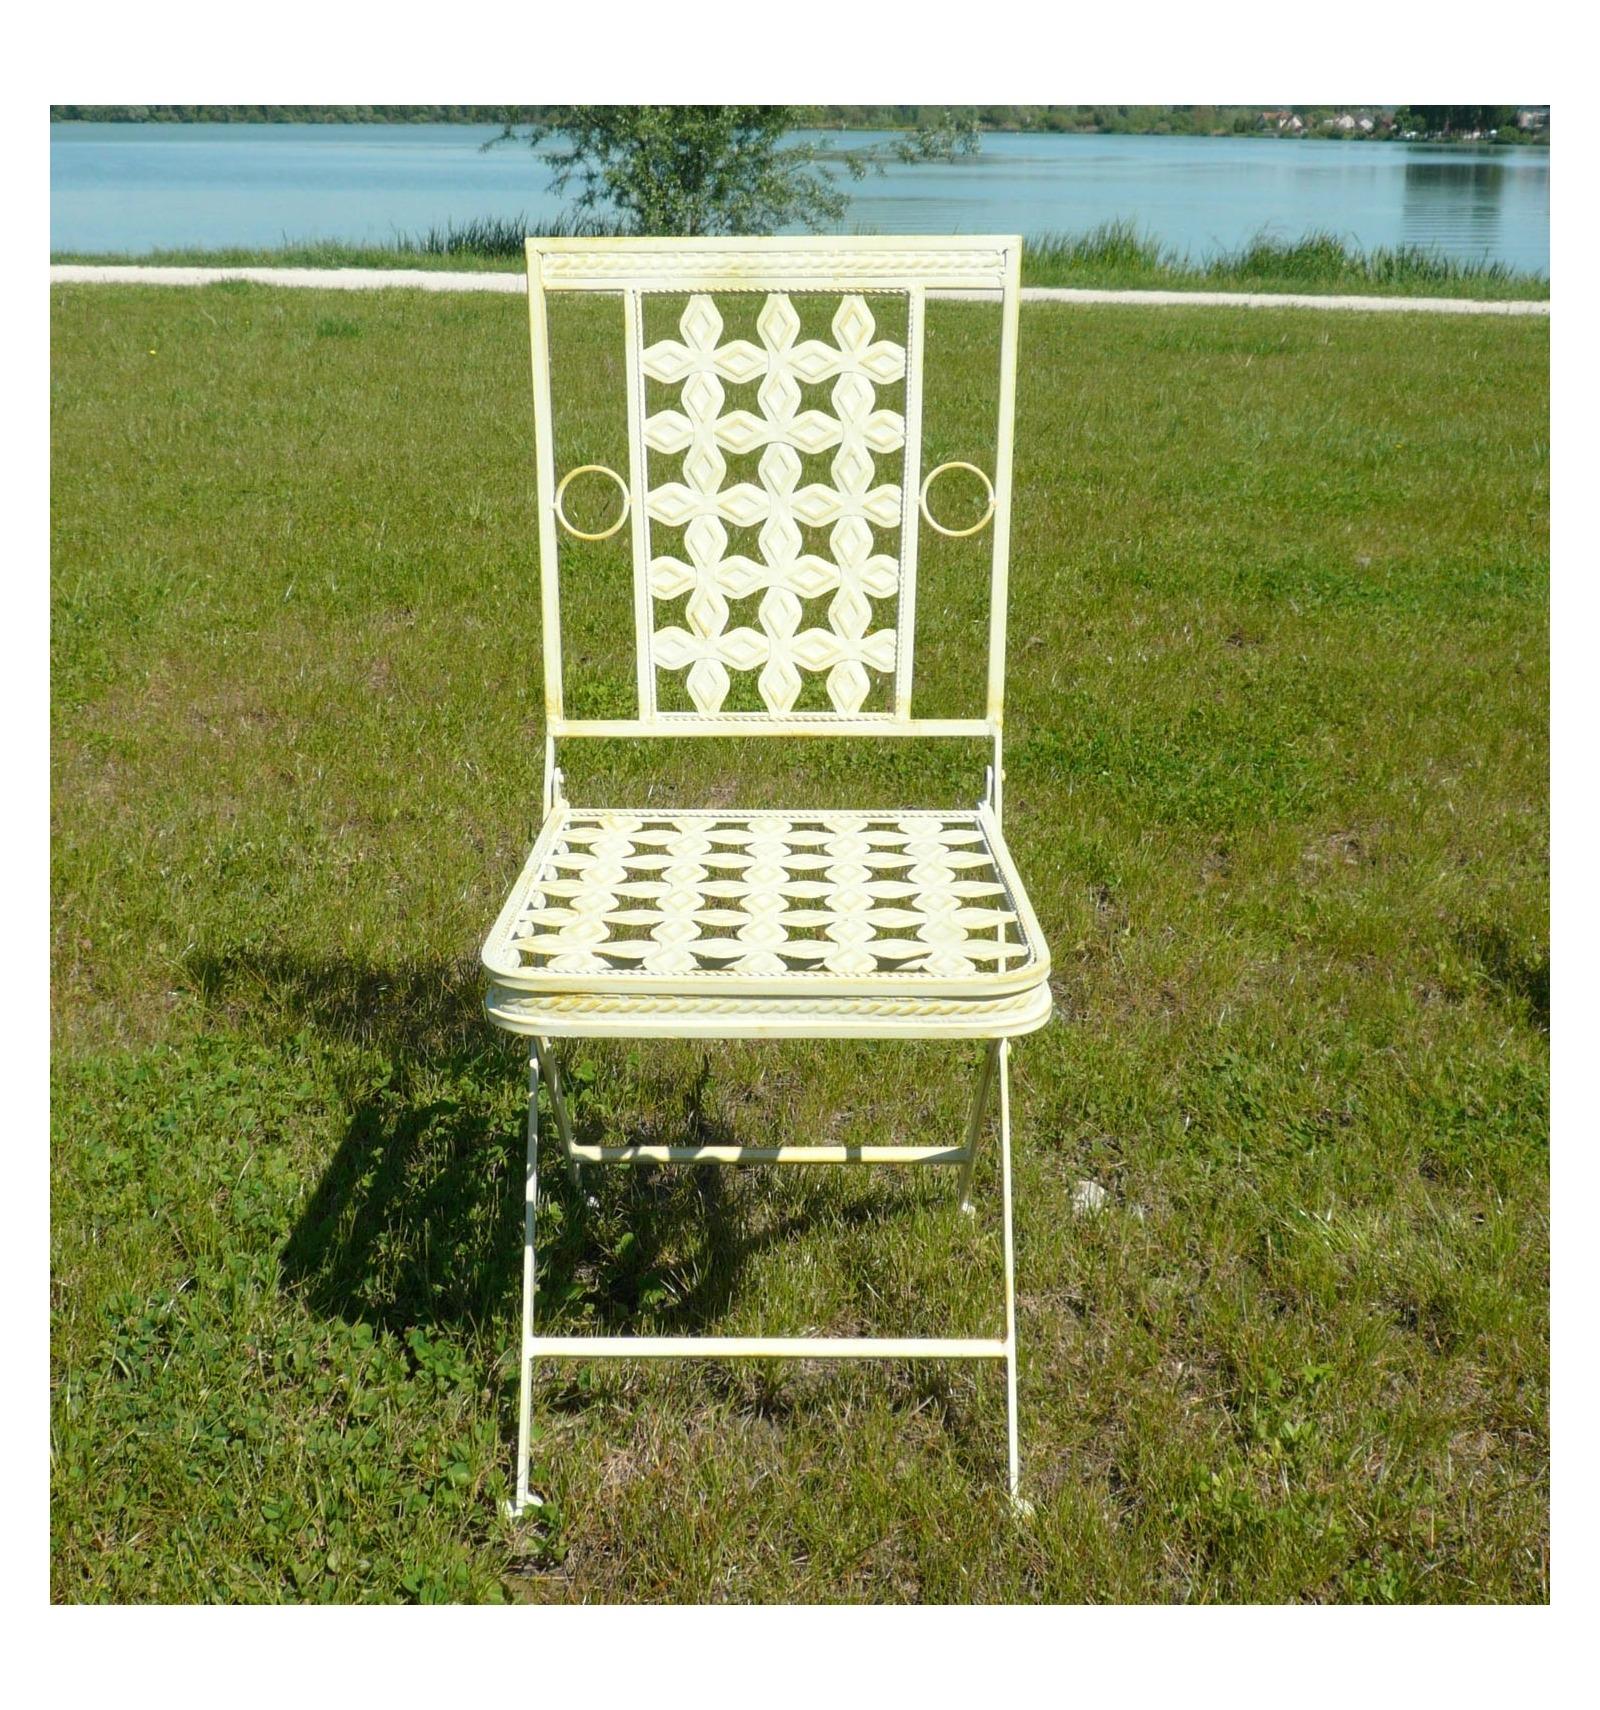 El hierro forjado muebles de jard n mesas sillas bancos - Muebles de hierro forjado para jardin ...